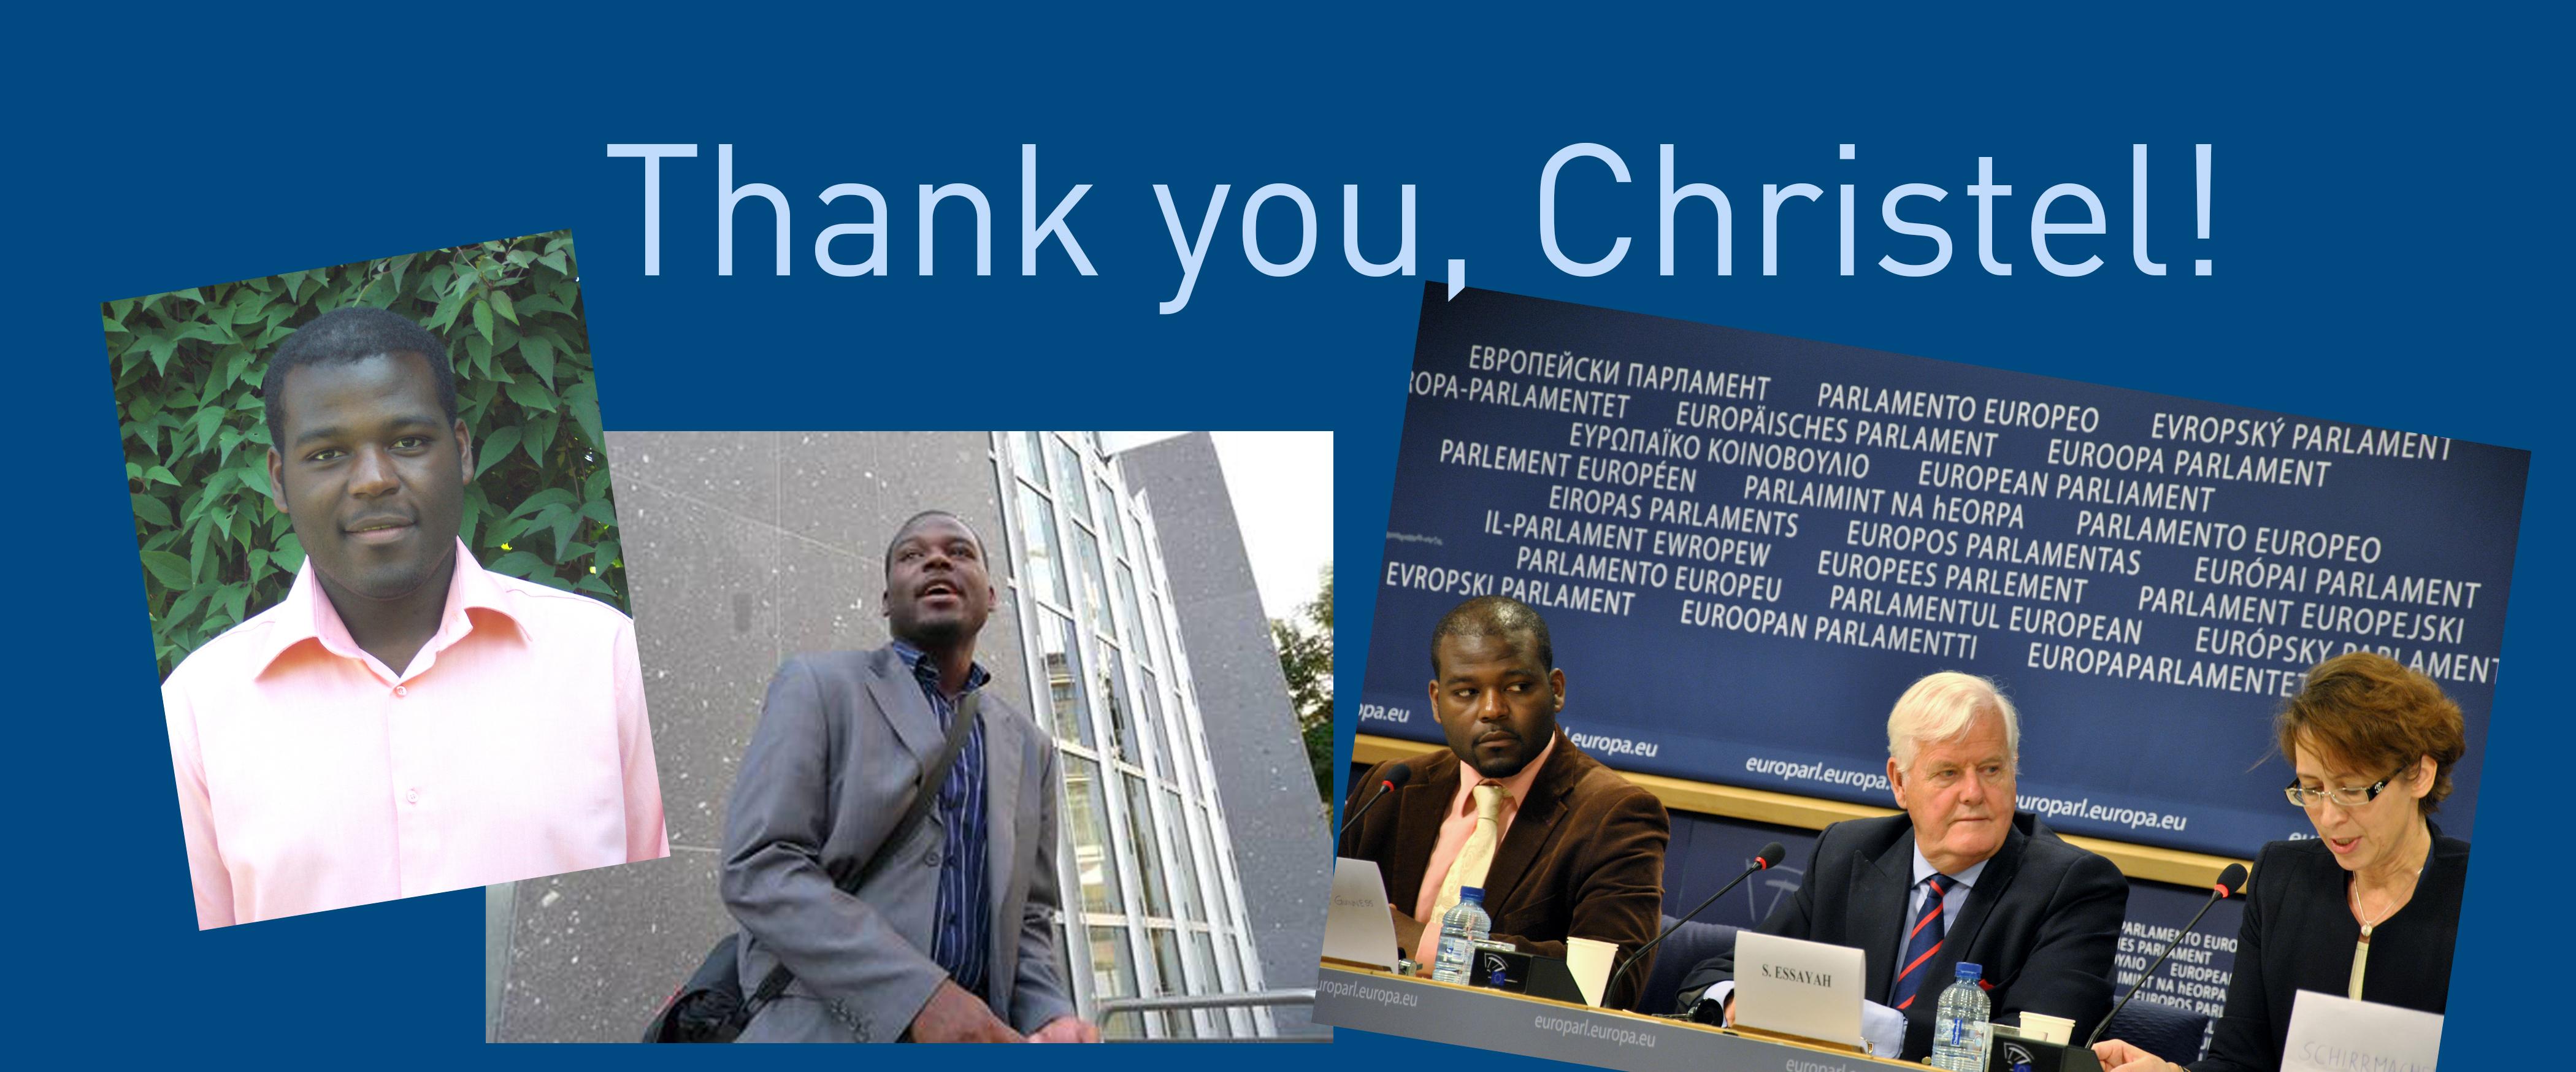 Thank you, Christel!